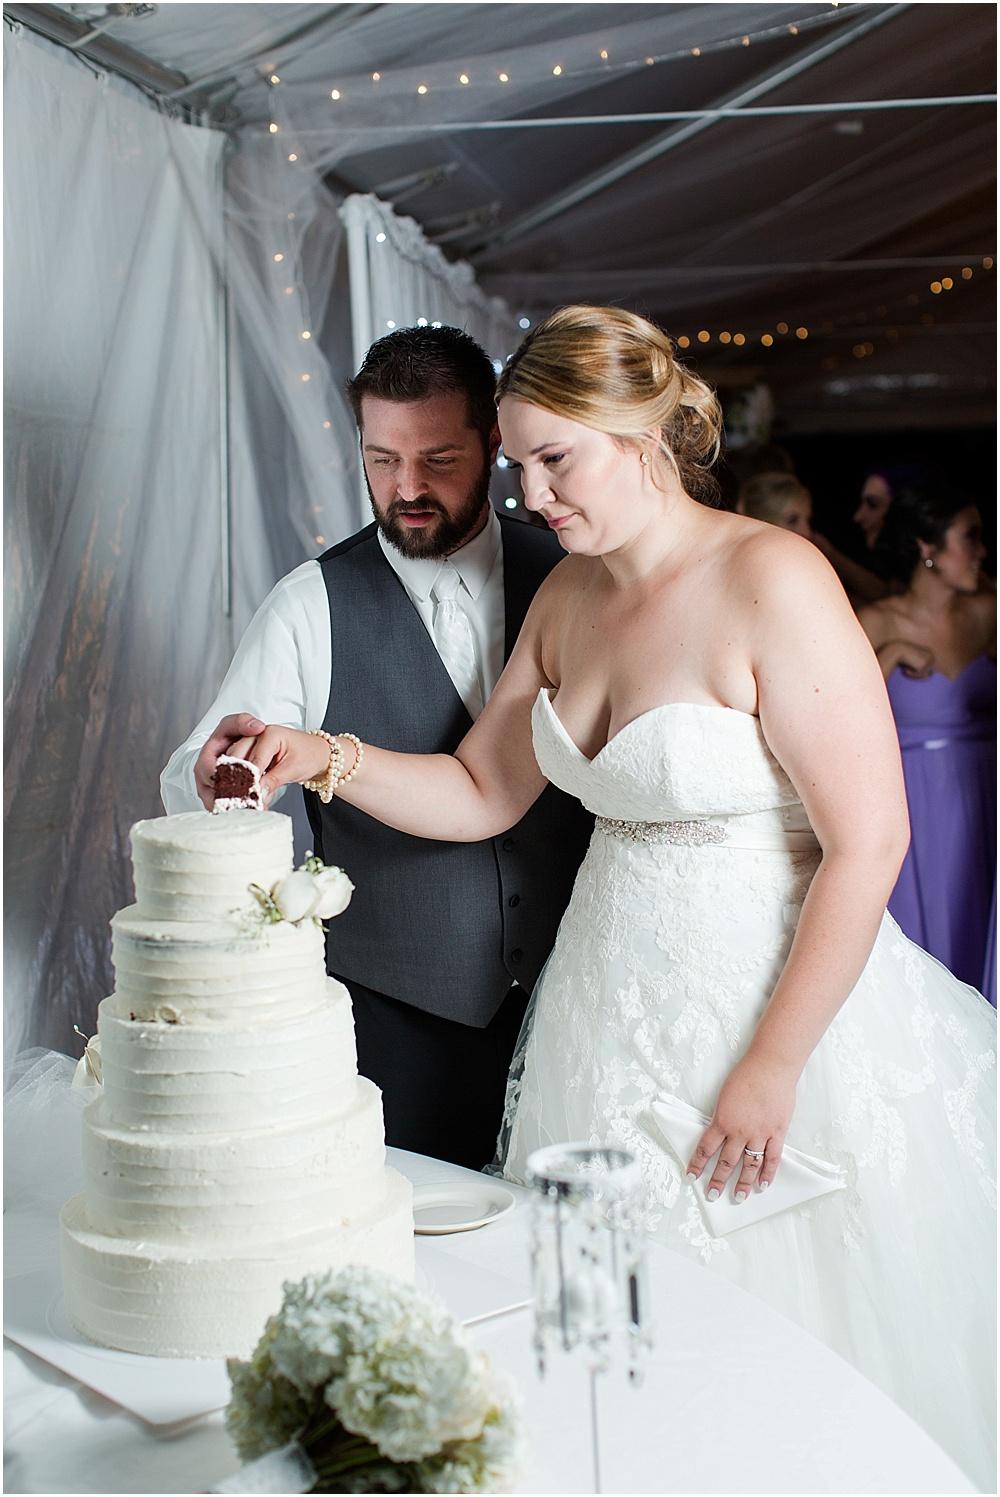 mitzner_silverdale_beach_hotel_wedding_silverdale_washington_pacific_northwest_wedding_photographer_0111